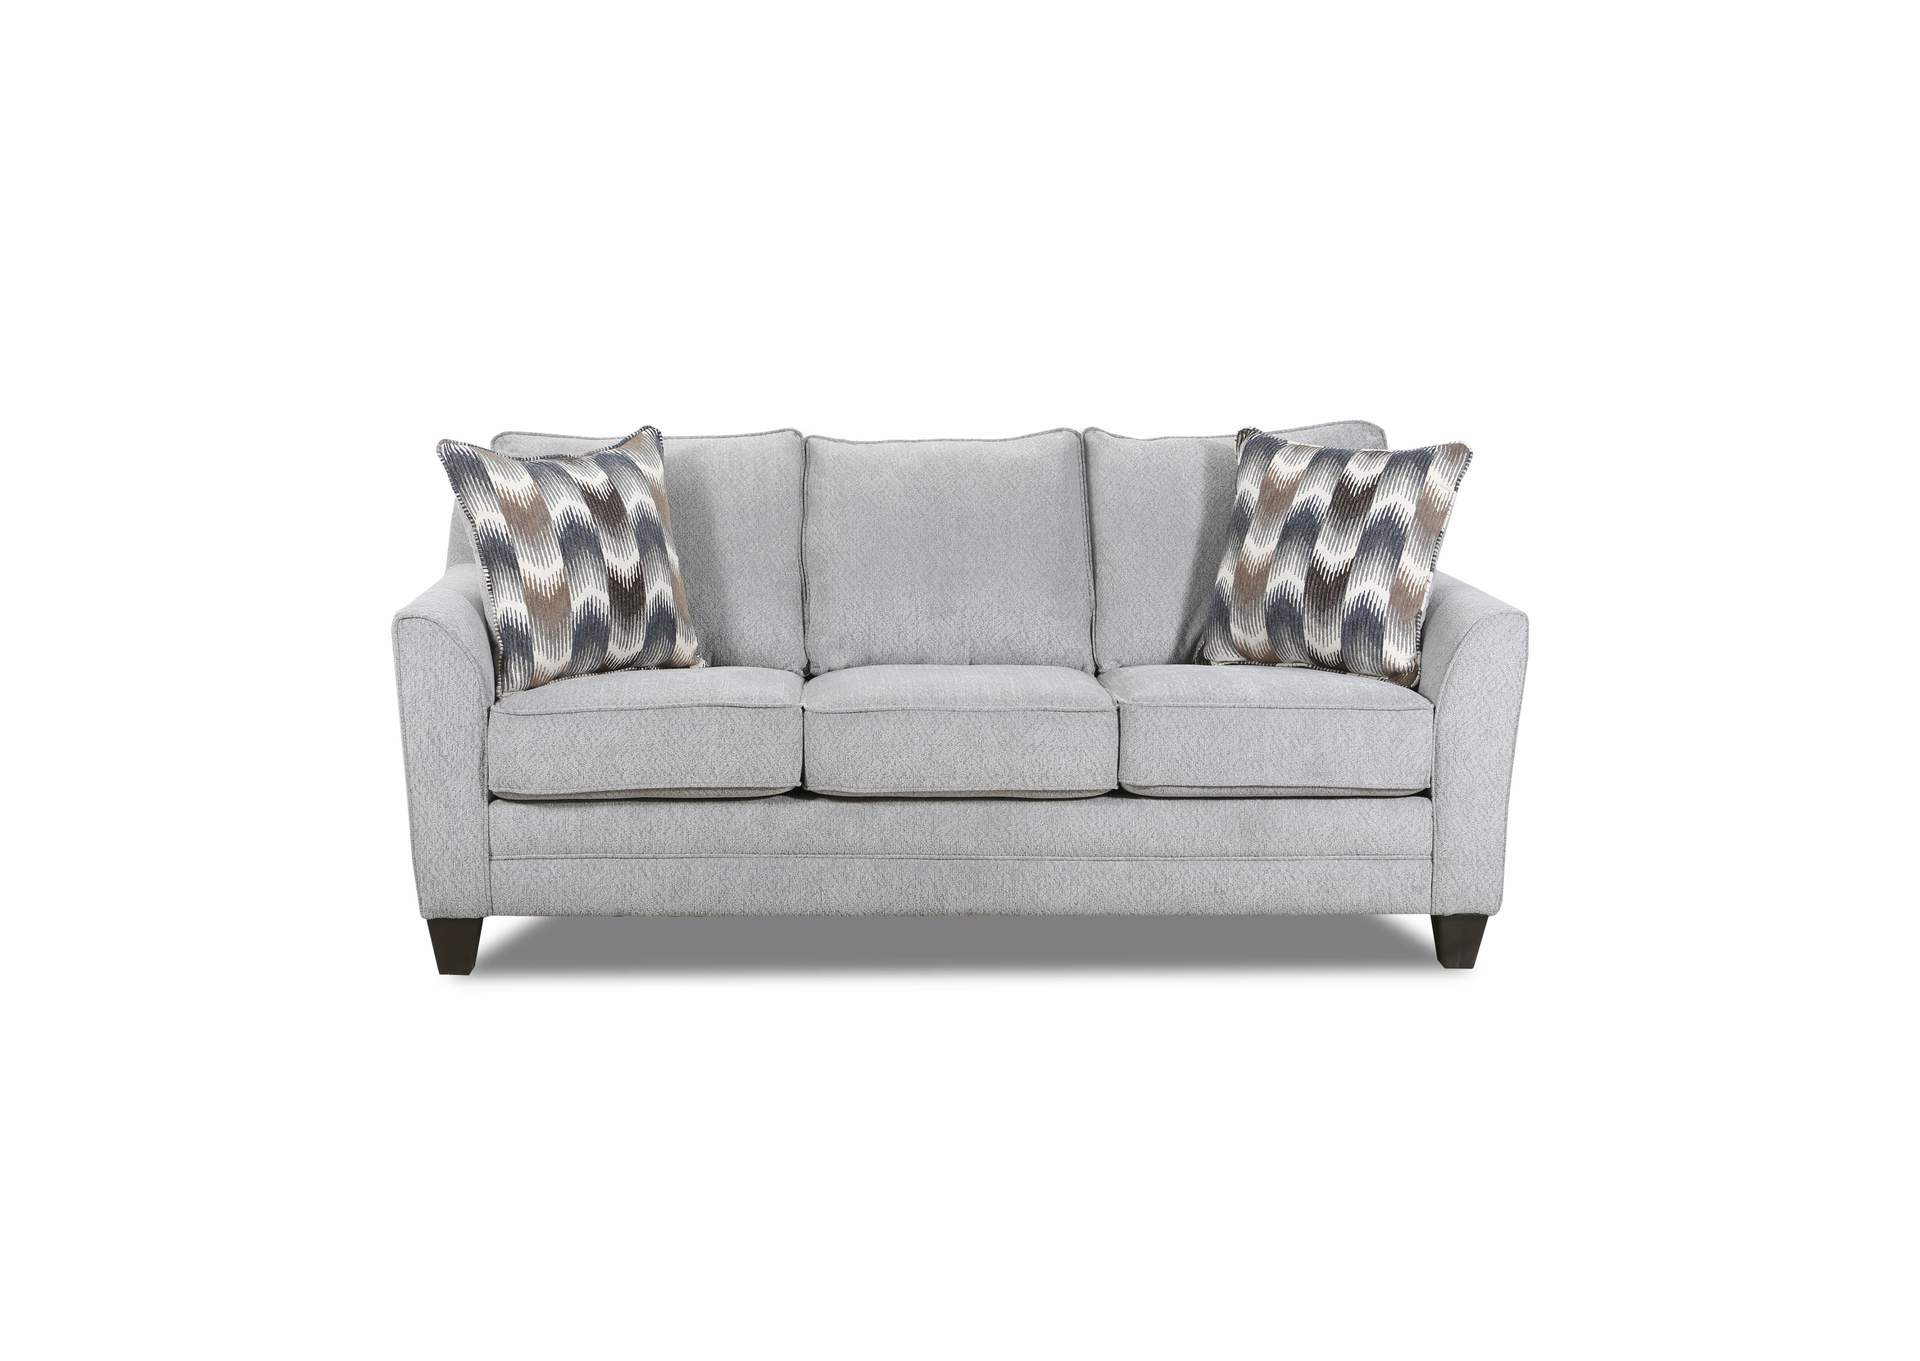 2013 Ferrin Sofa